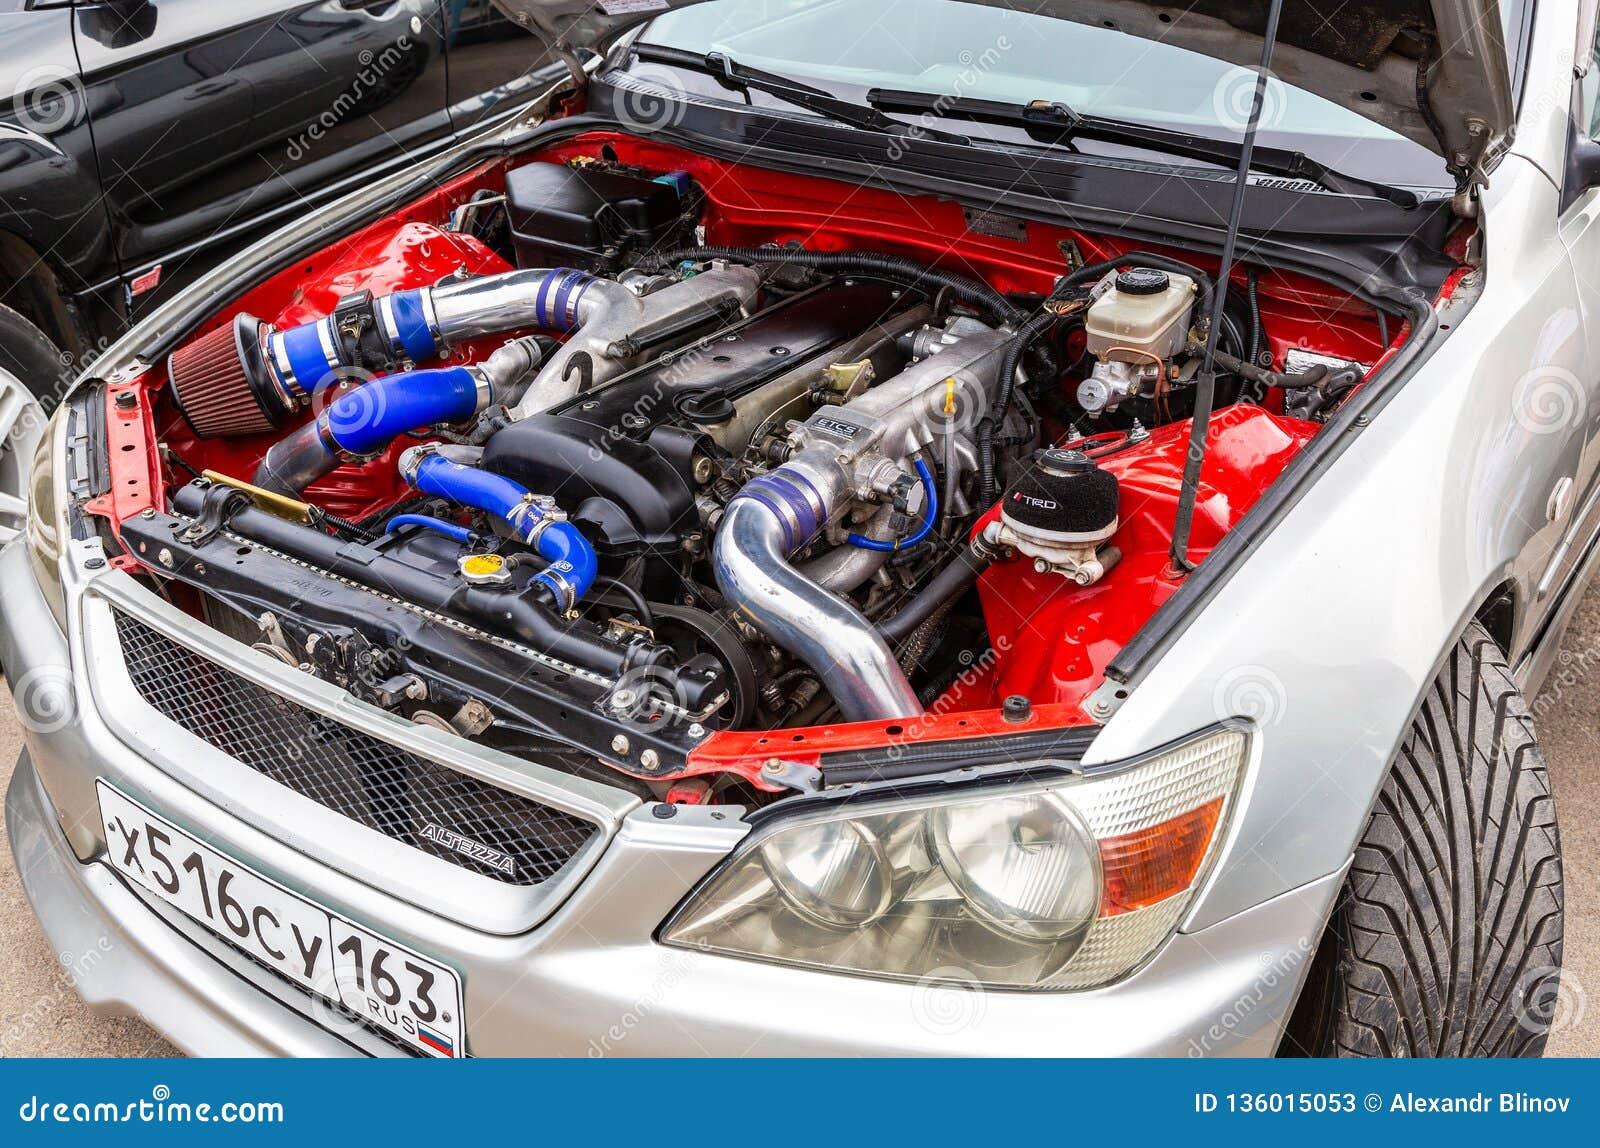 Kelebihan Kekurangan Toyota Altezza Spesifikasi